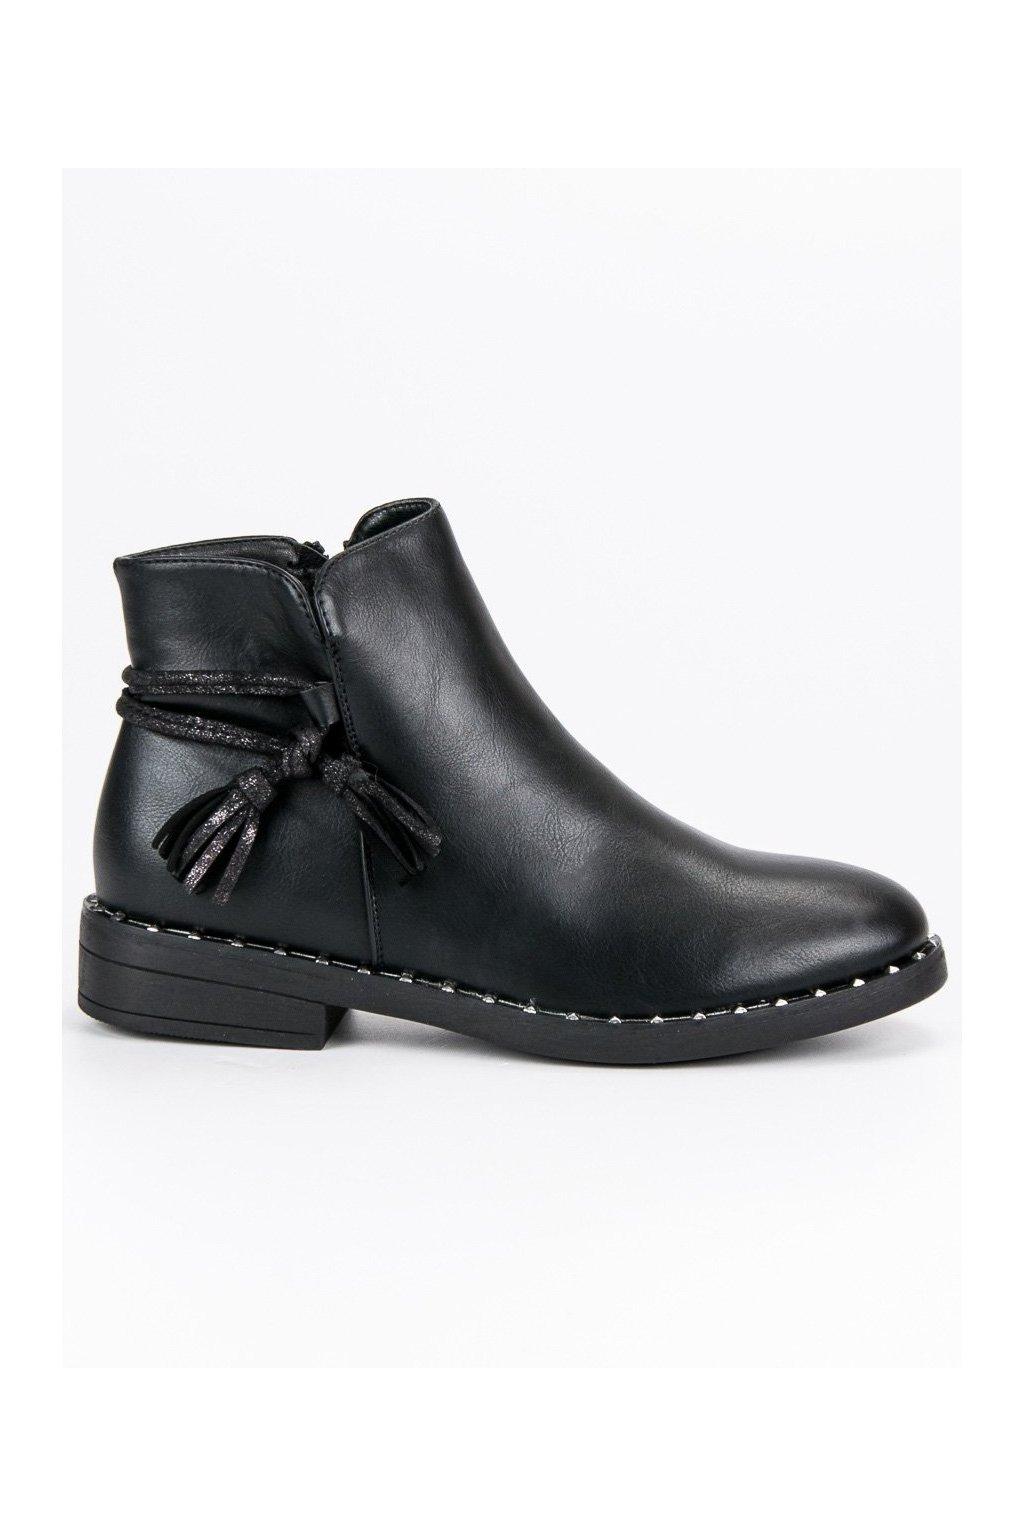 Ploché čierne topánky na zimu Filippo  aed7593972